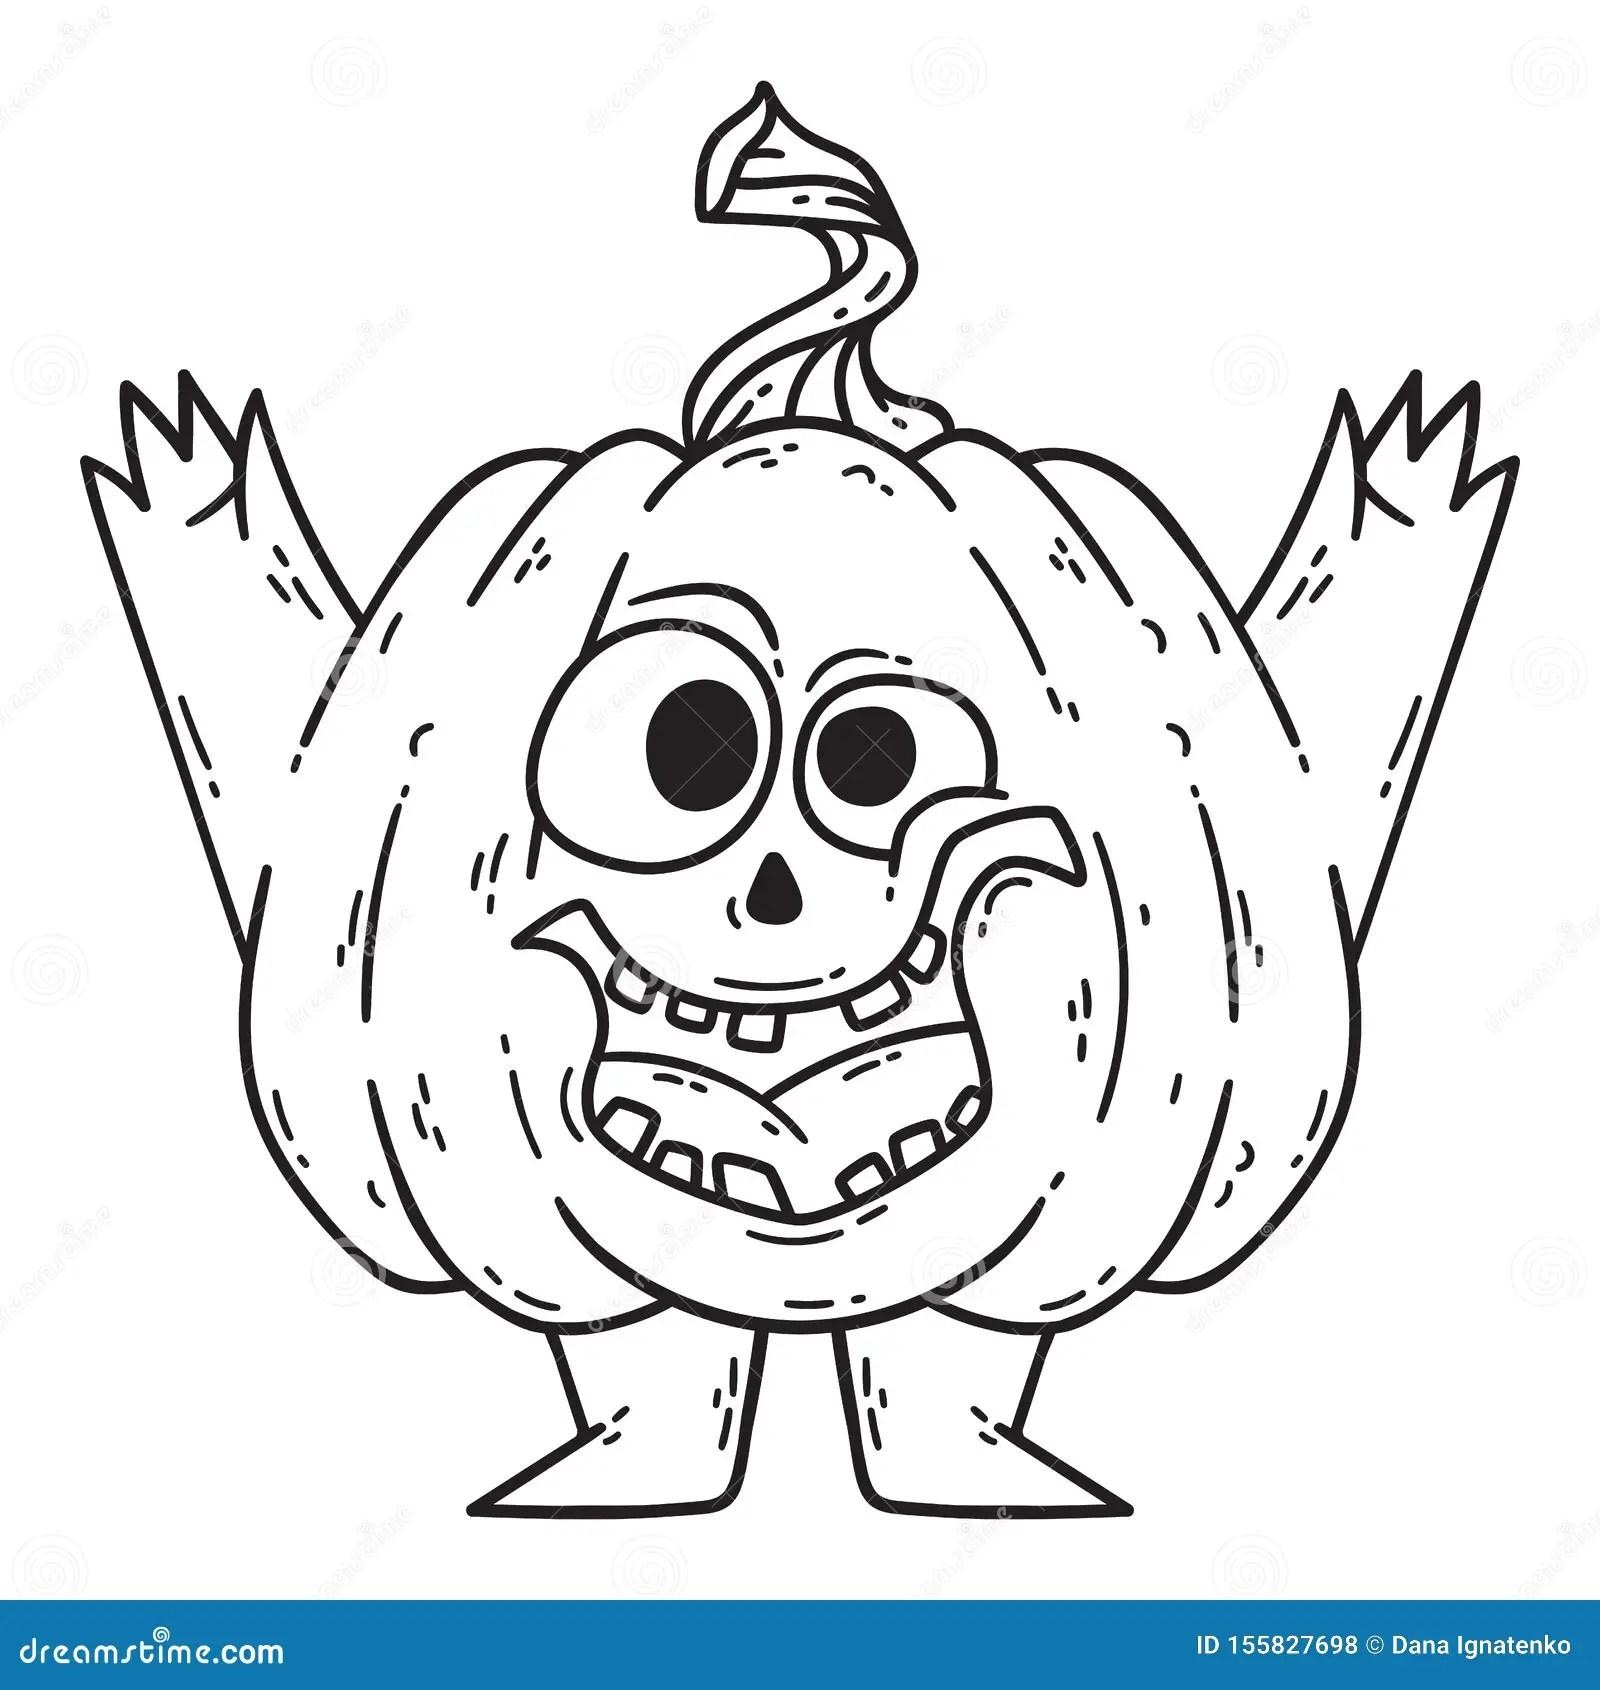 Halloween Smiling Pumpkin With Hands And Legs Stock Vector